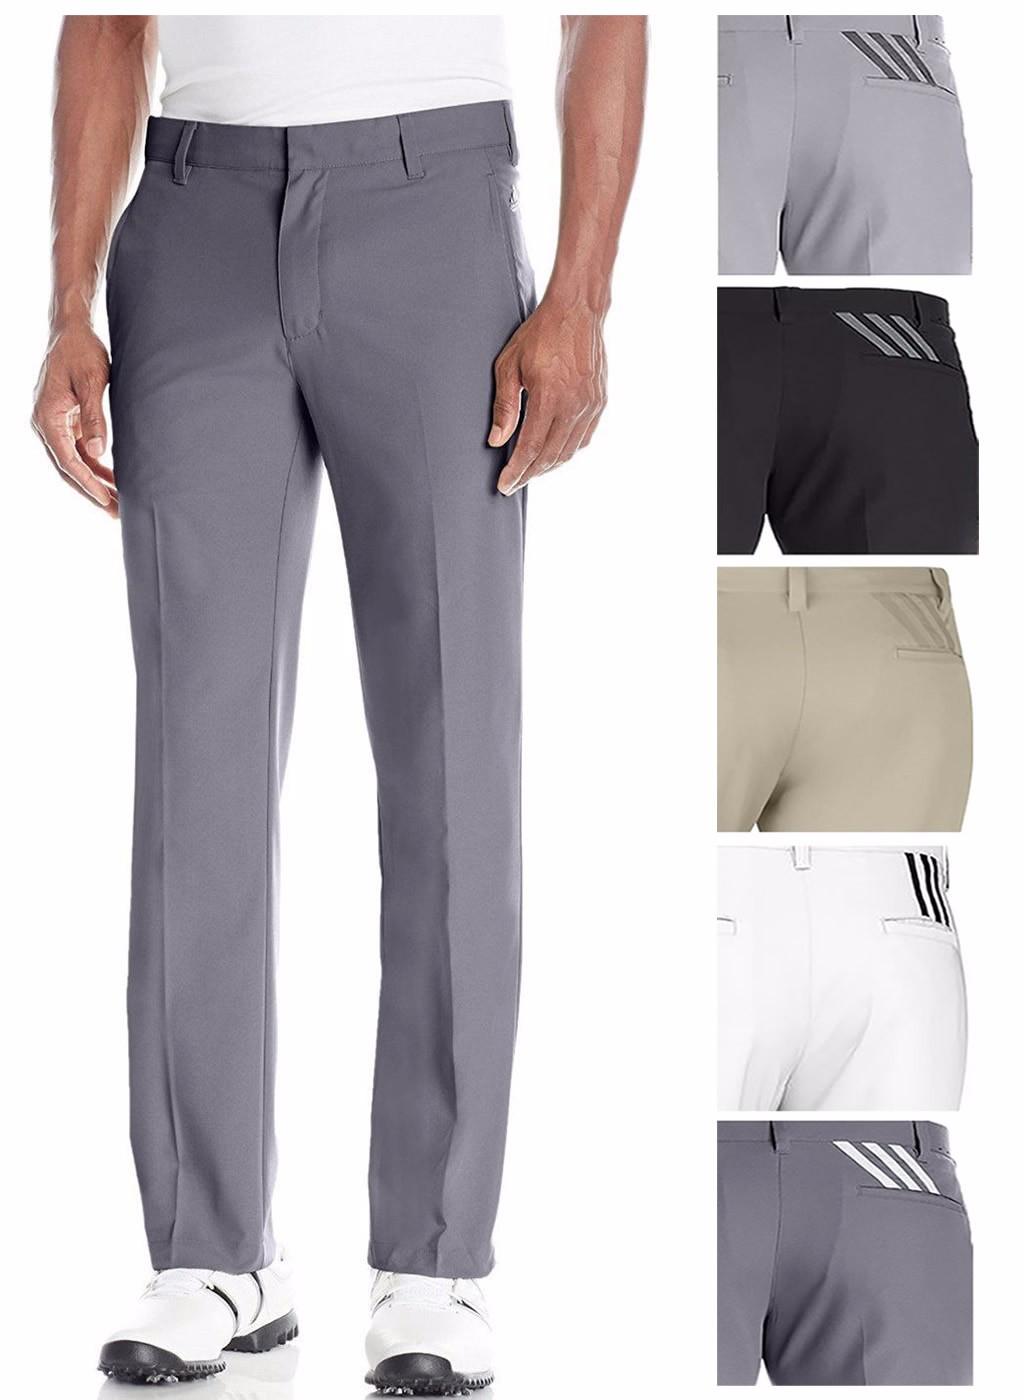 Fashion week Golf Adidas pants for woman